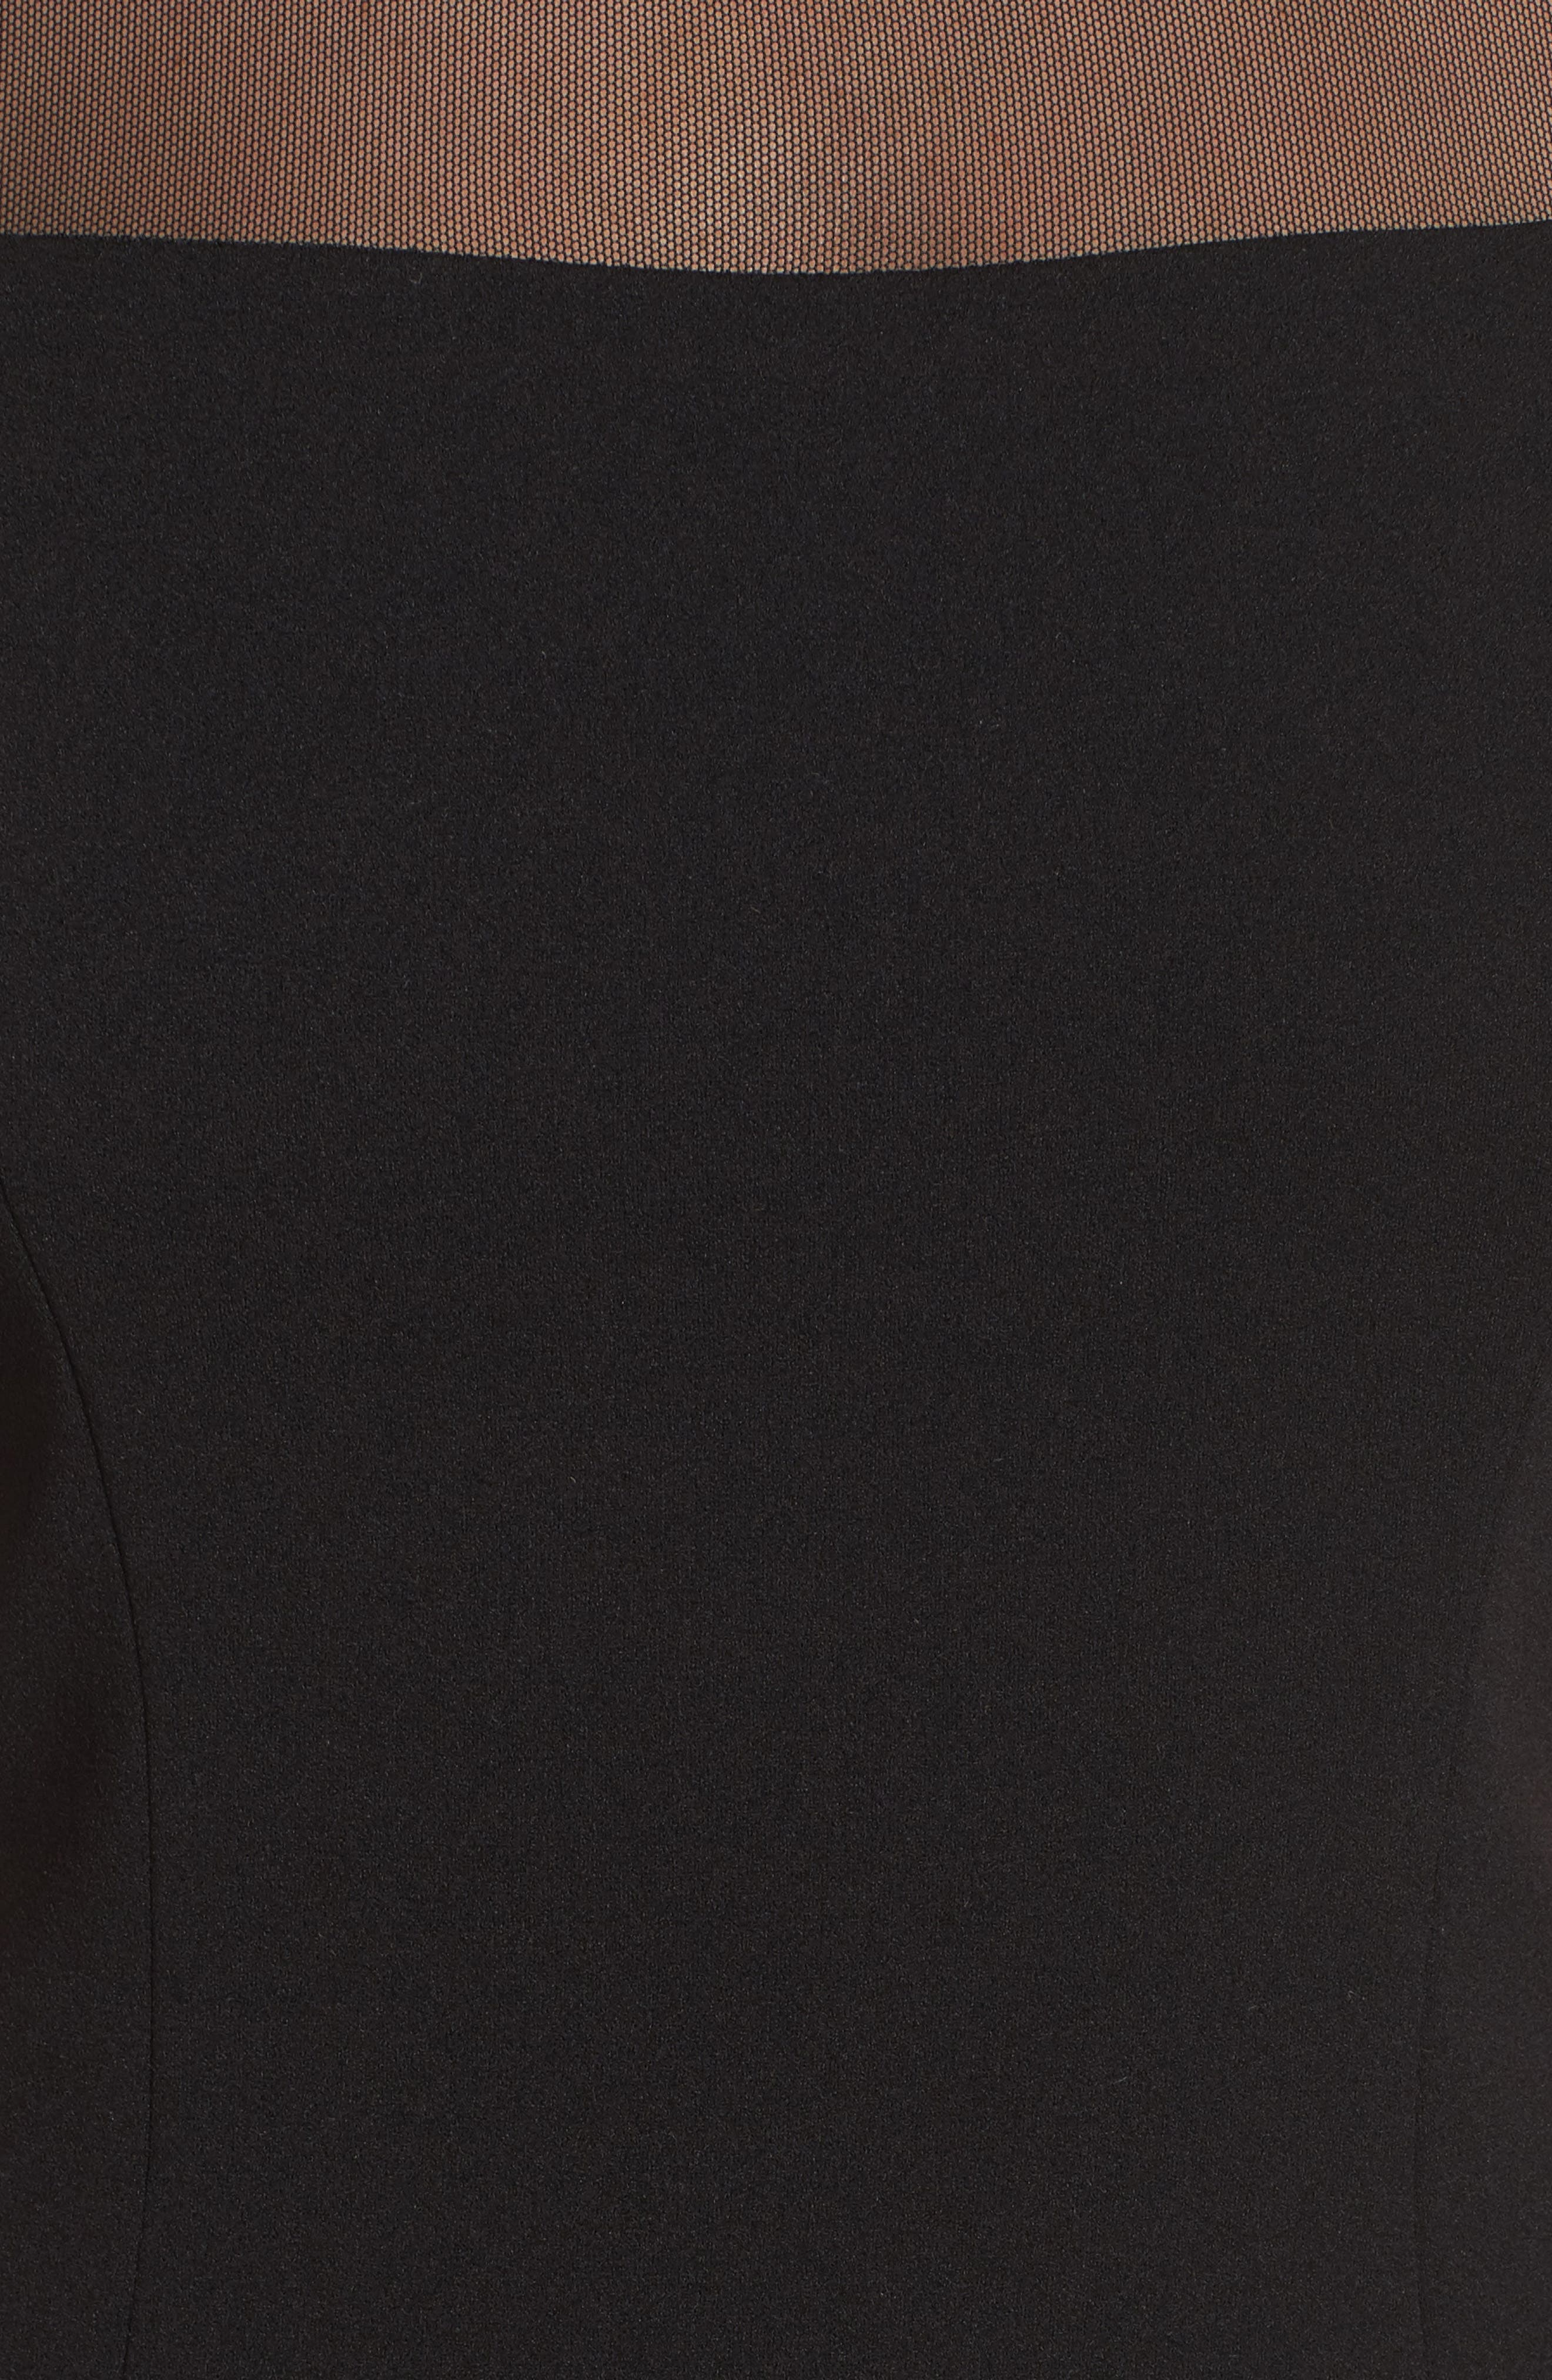 Illusion Stripe Trumpet Gown,                             Alternate thumbnail 5, color,                             Black